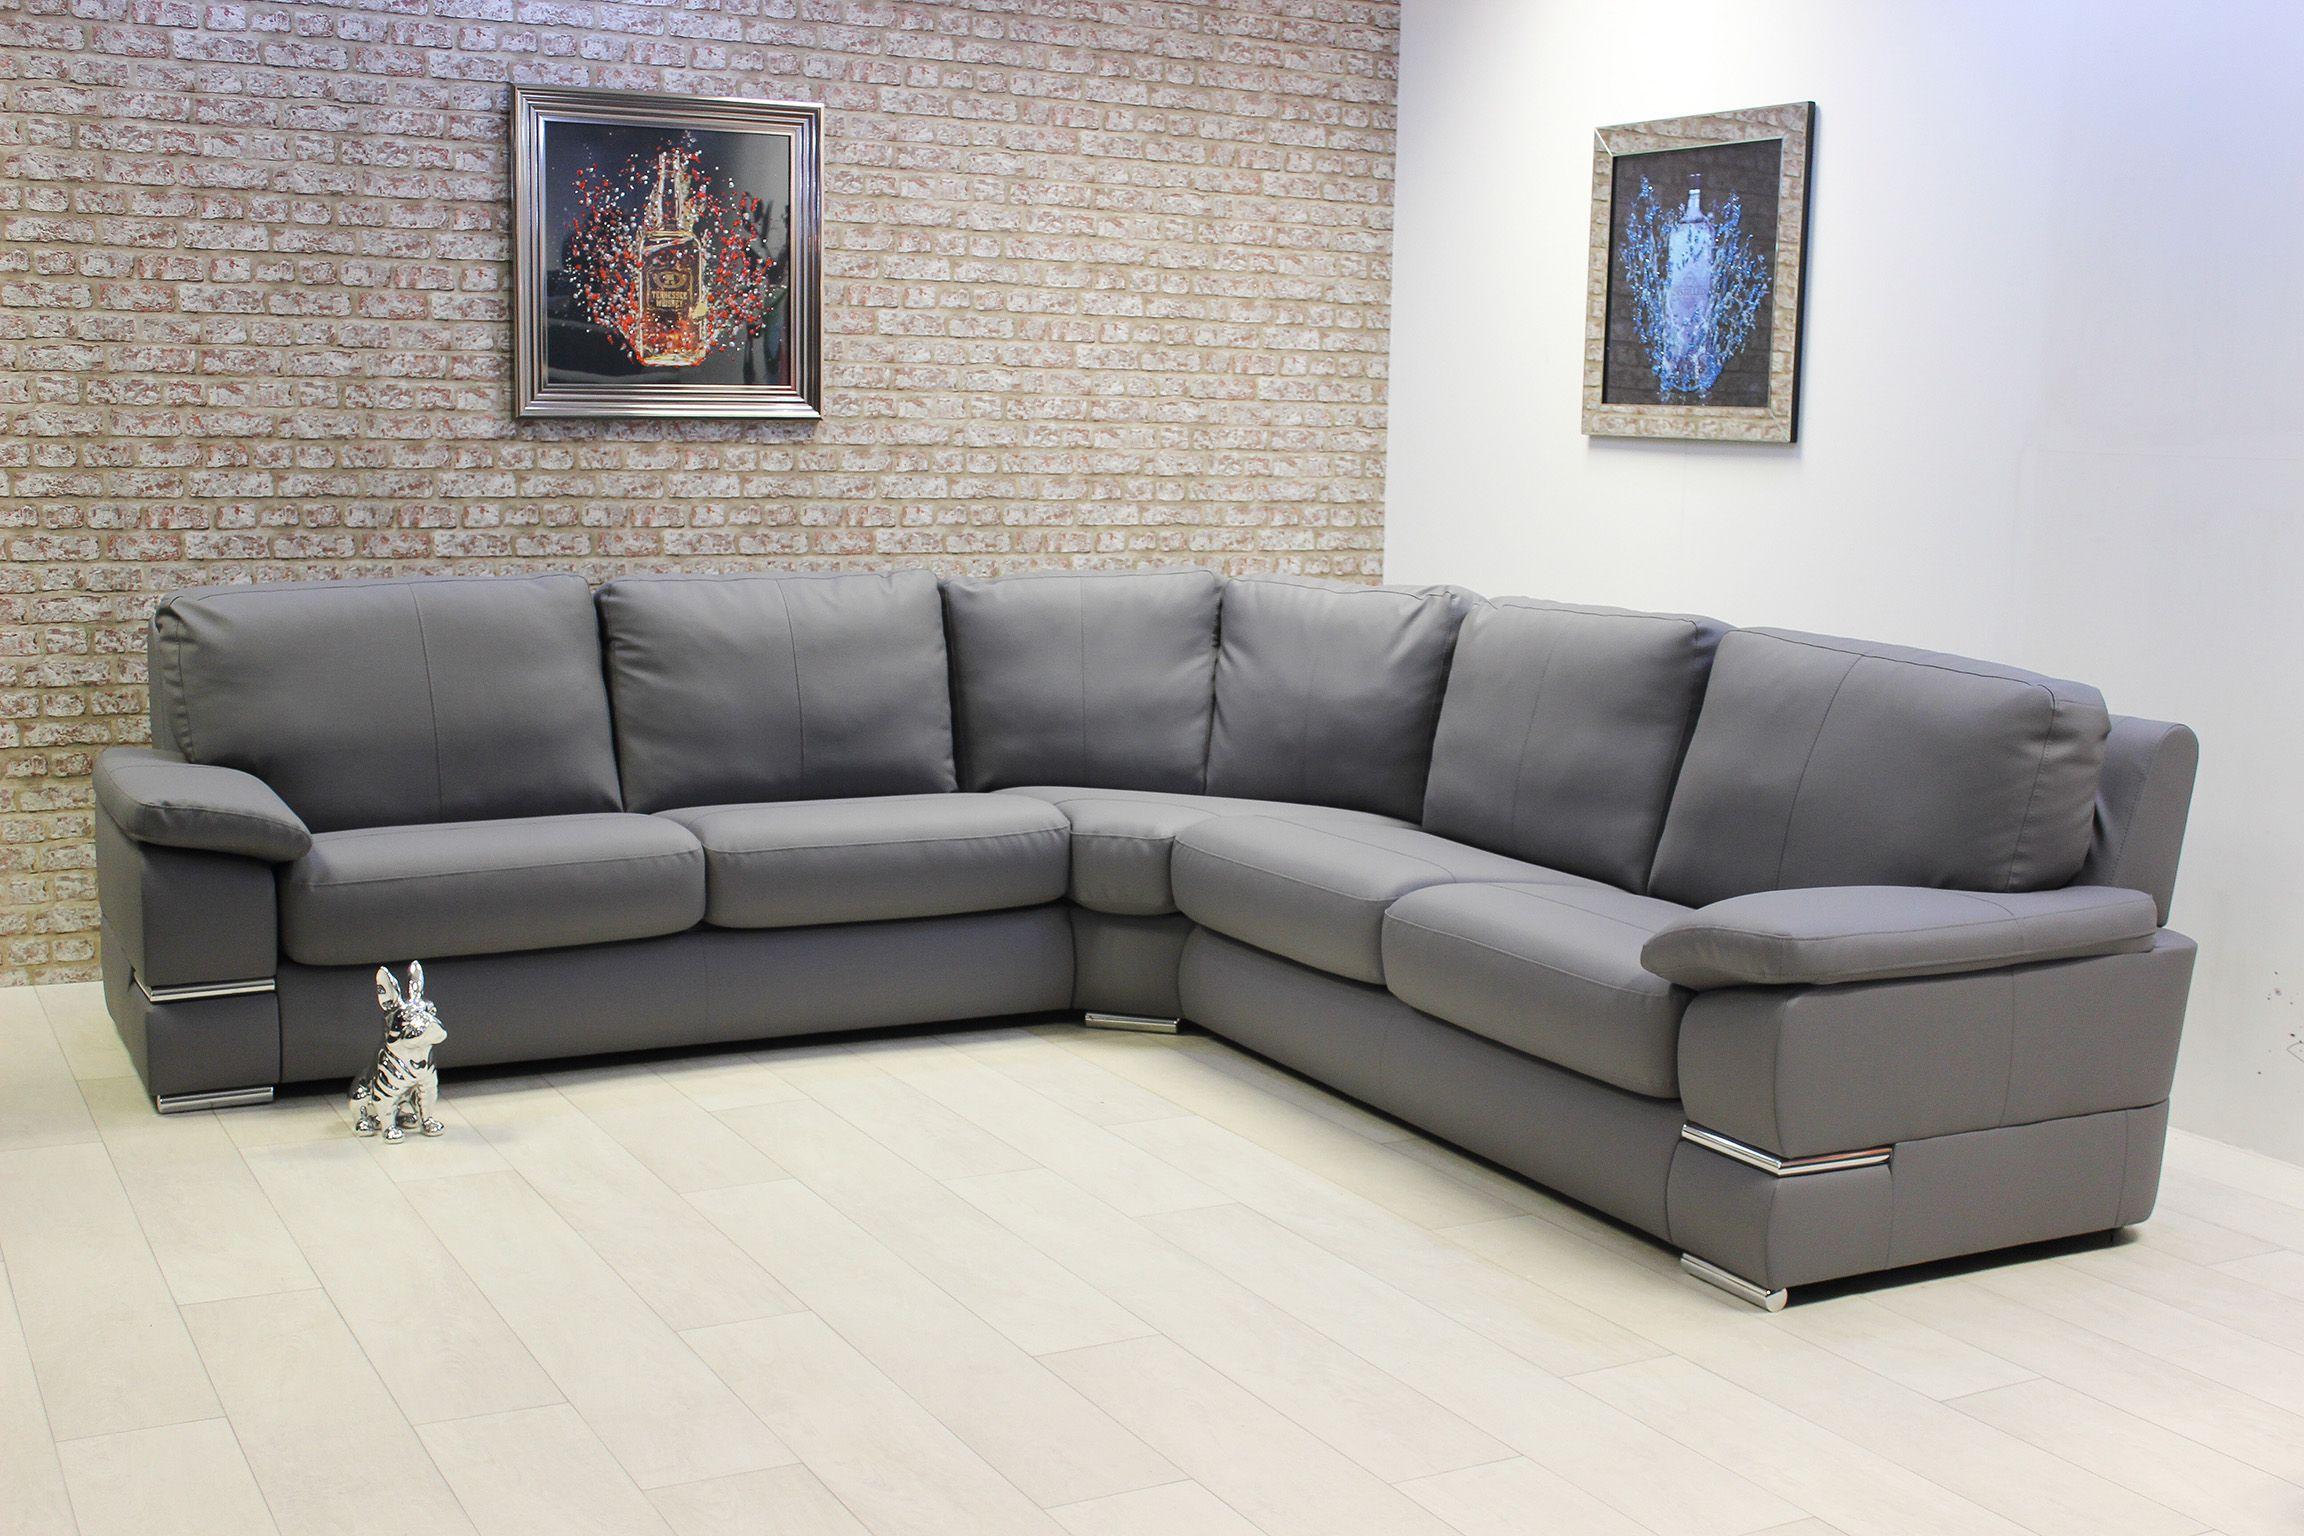 Sydney Corner Trade Sofas Sofa sale, Corner sofa, Sofa